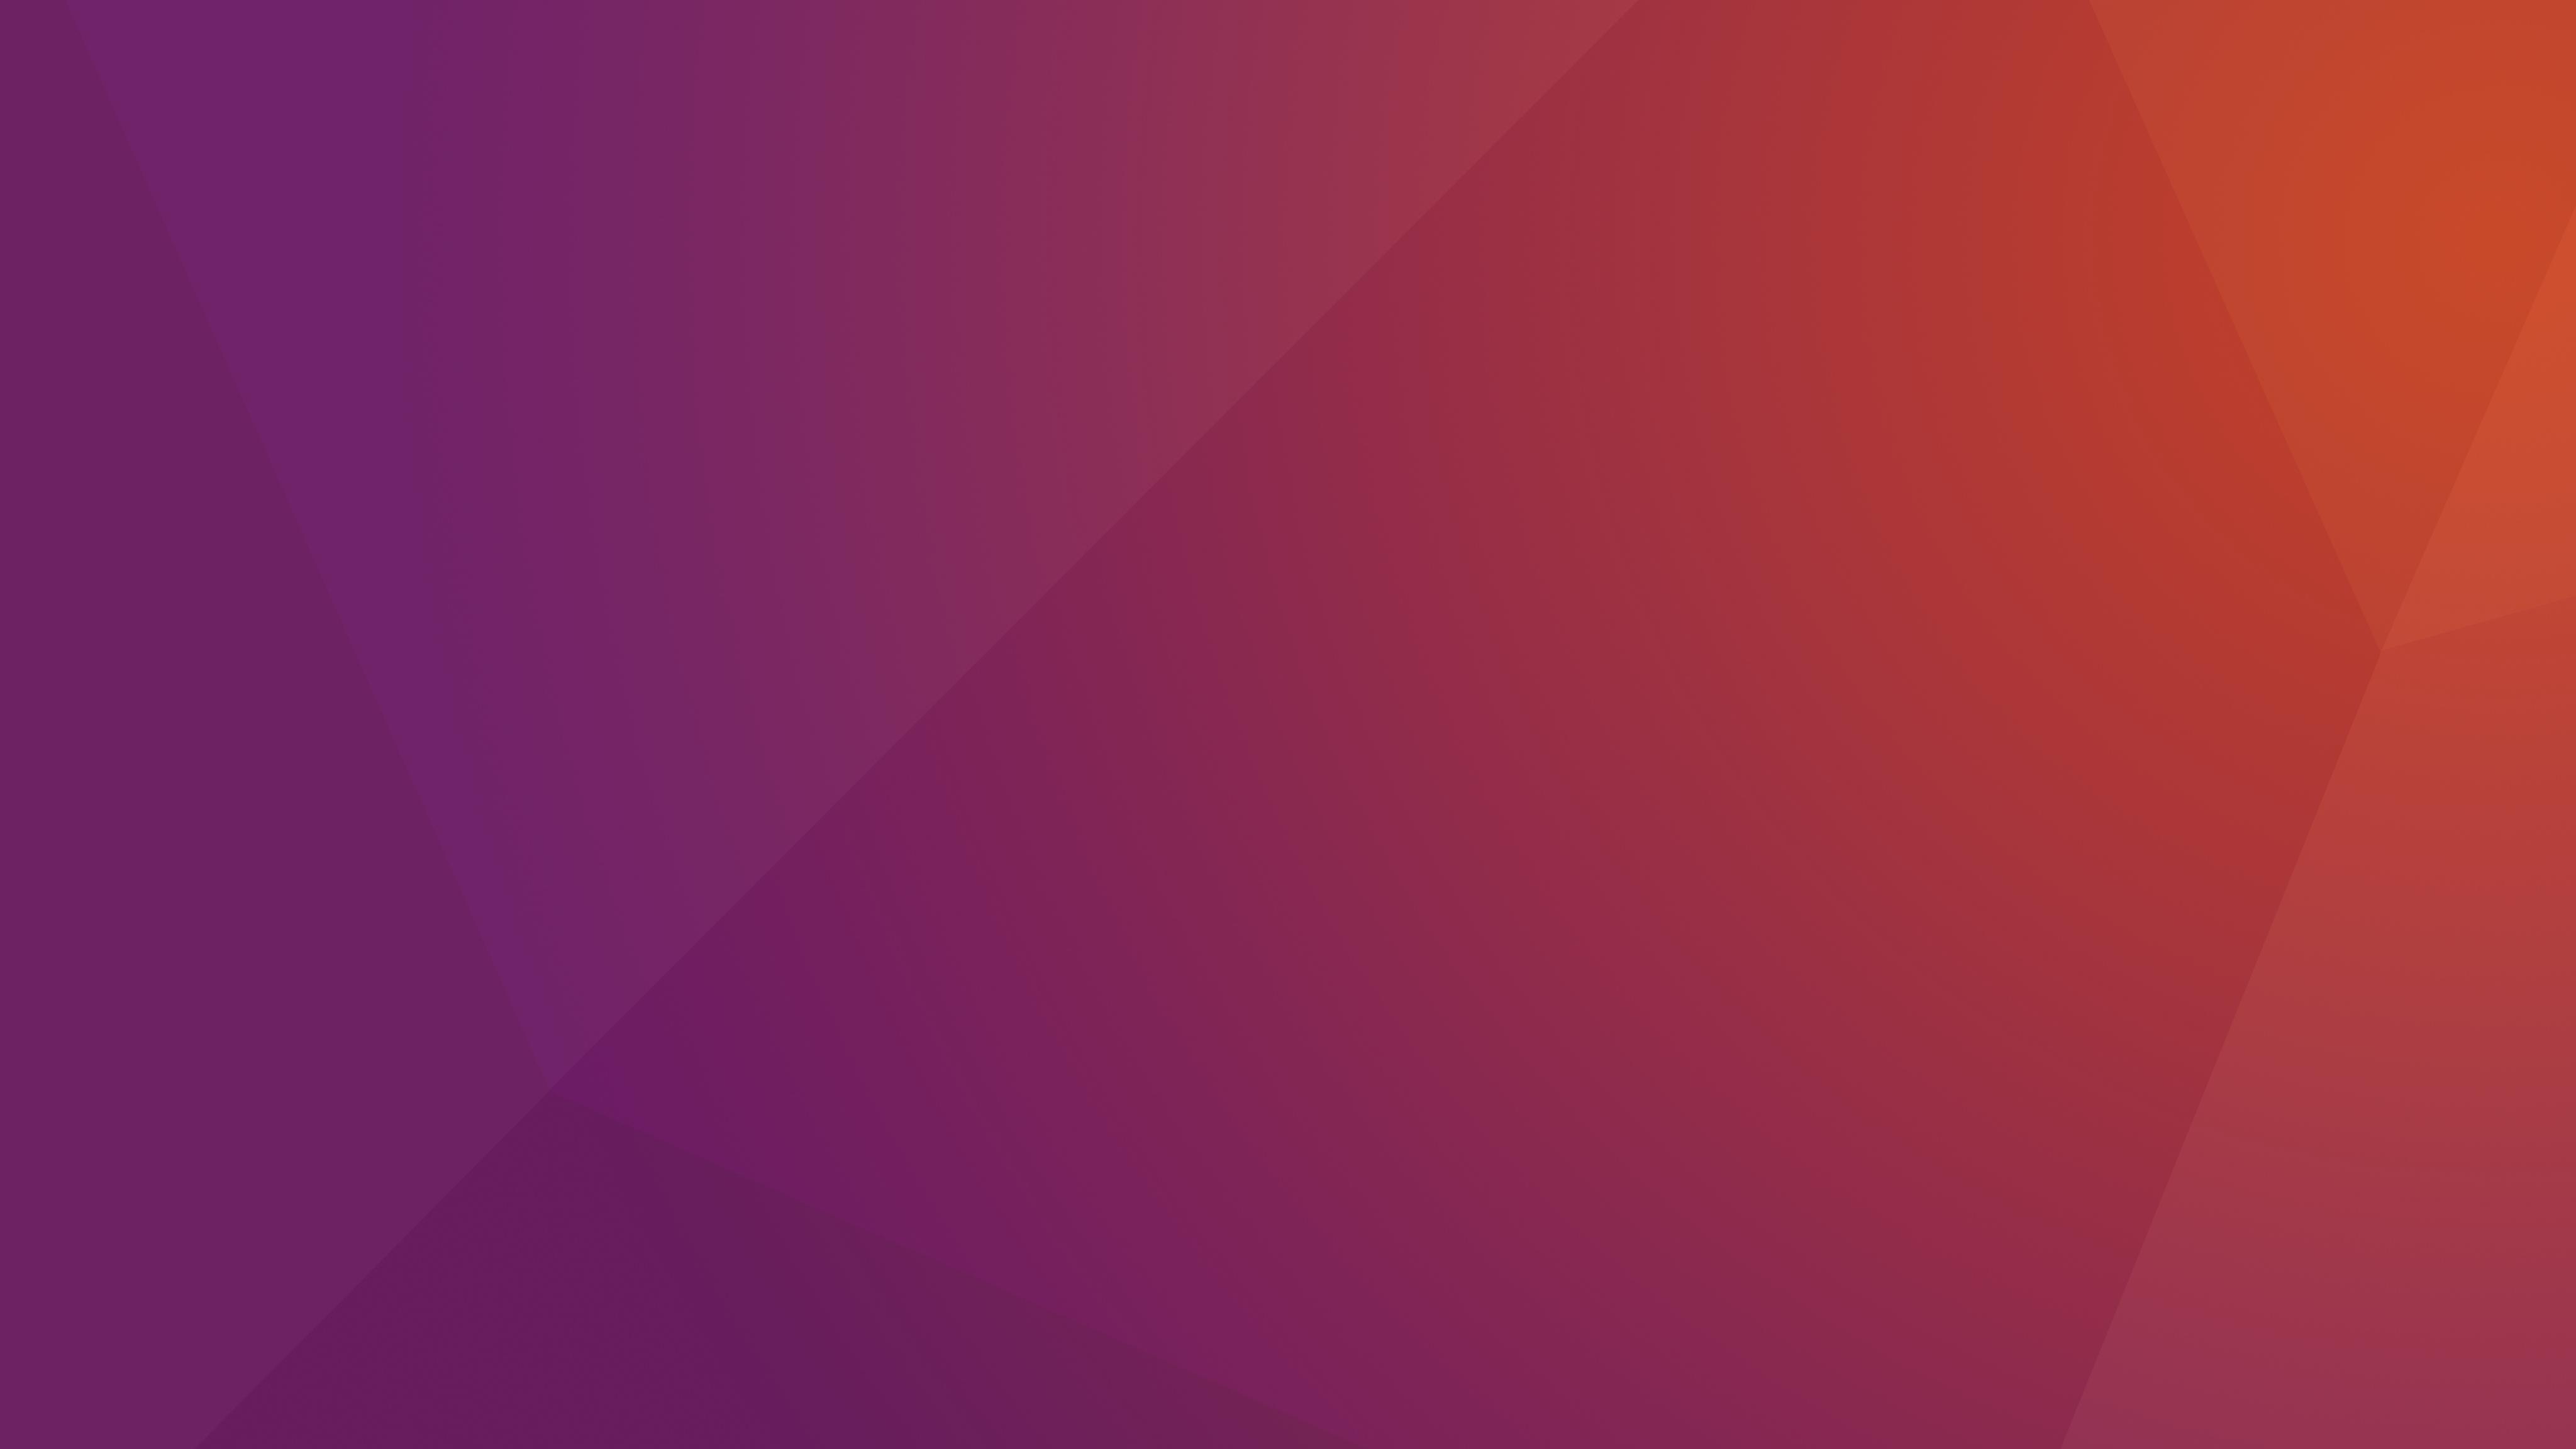 Xerus_Wallpaper_4096x2304